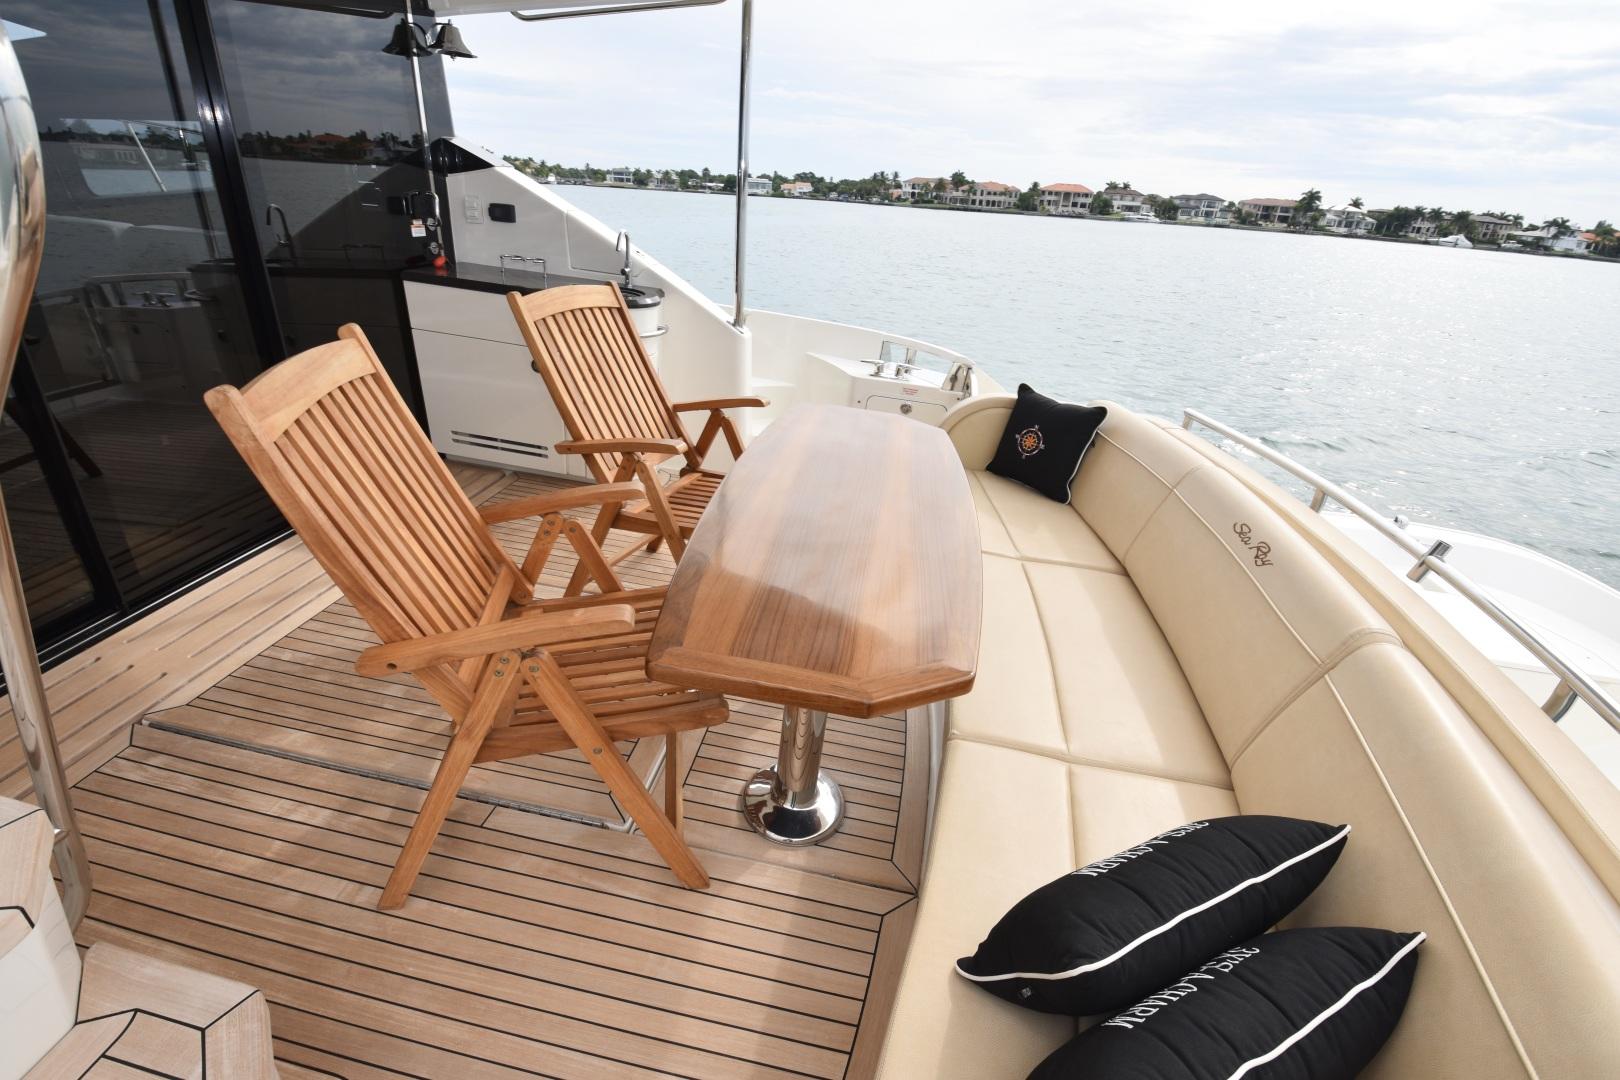 Sea Ray-L650 2016-3x's the Charm Longboat Key-Florida-United States-2016 Sea Ray L650  3x's the Charm  Aft Cockpit-1251841 | Thumbnail